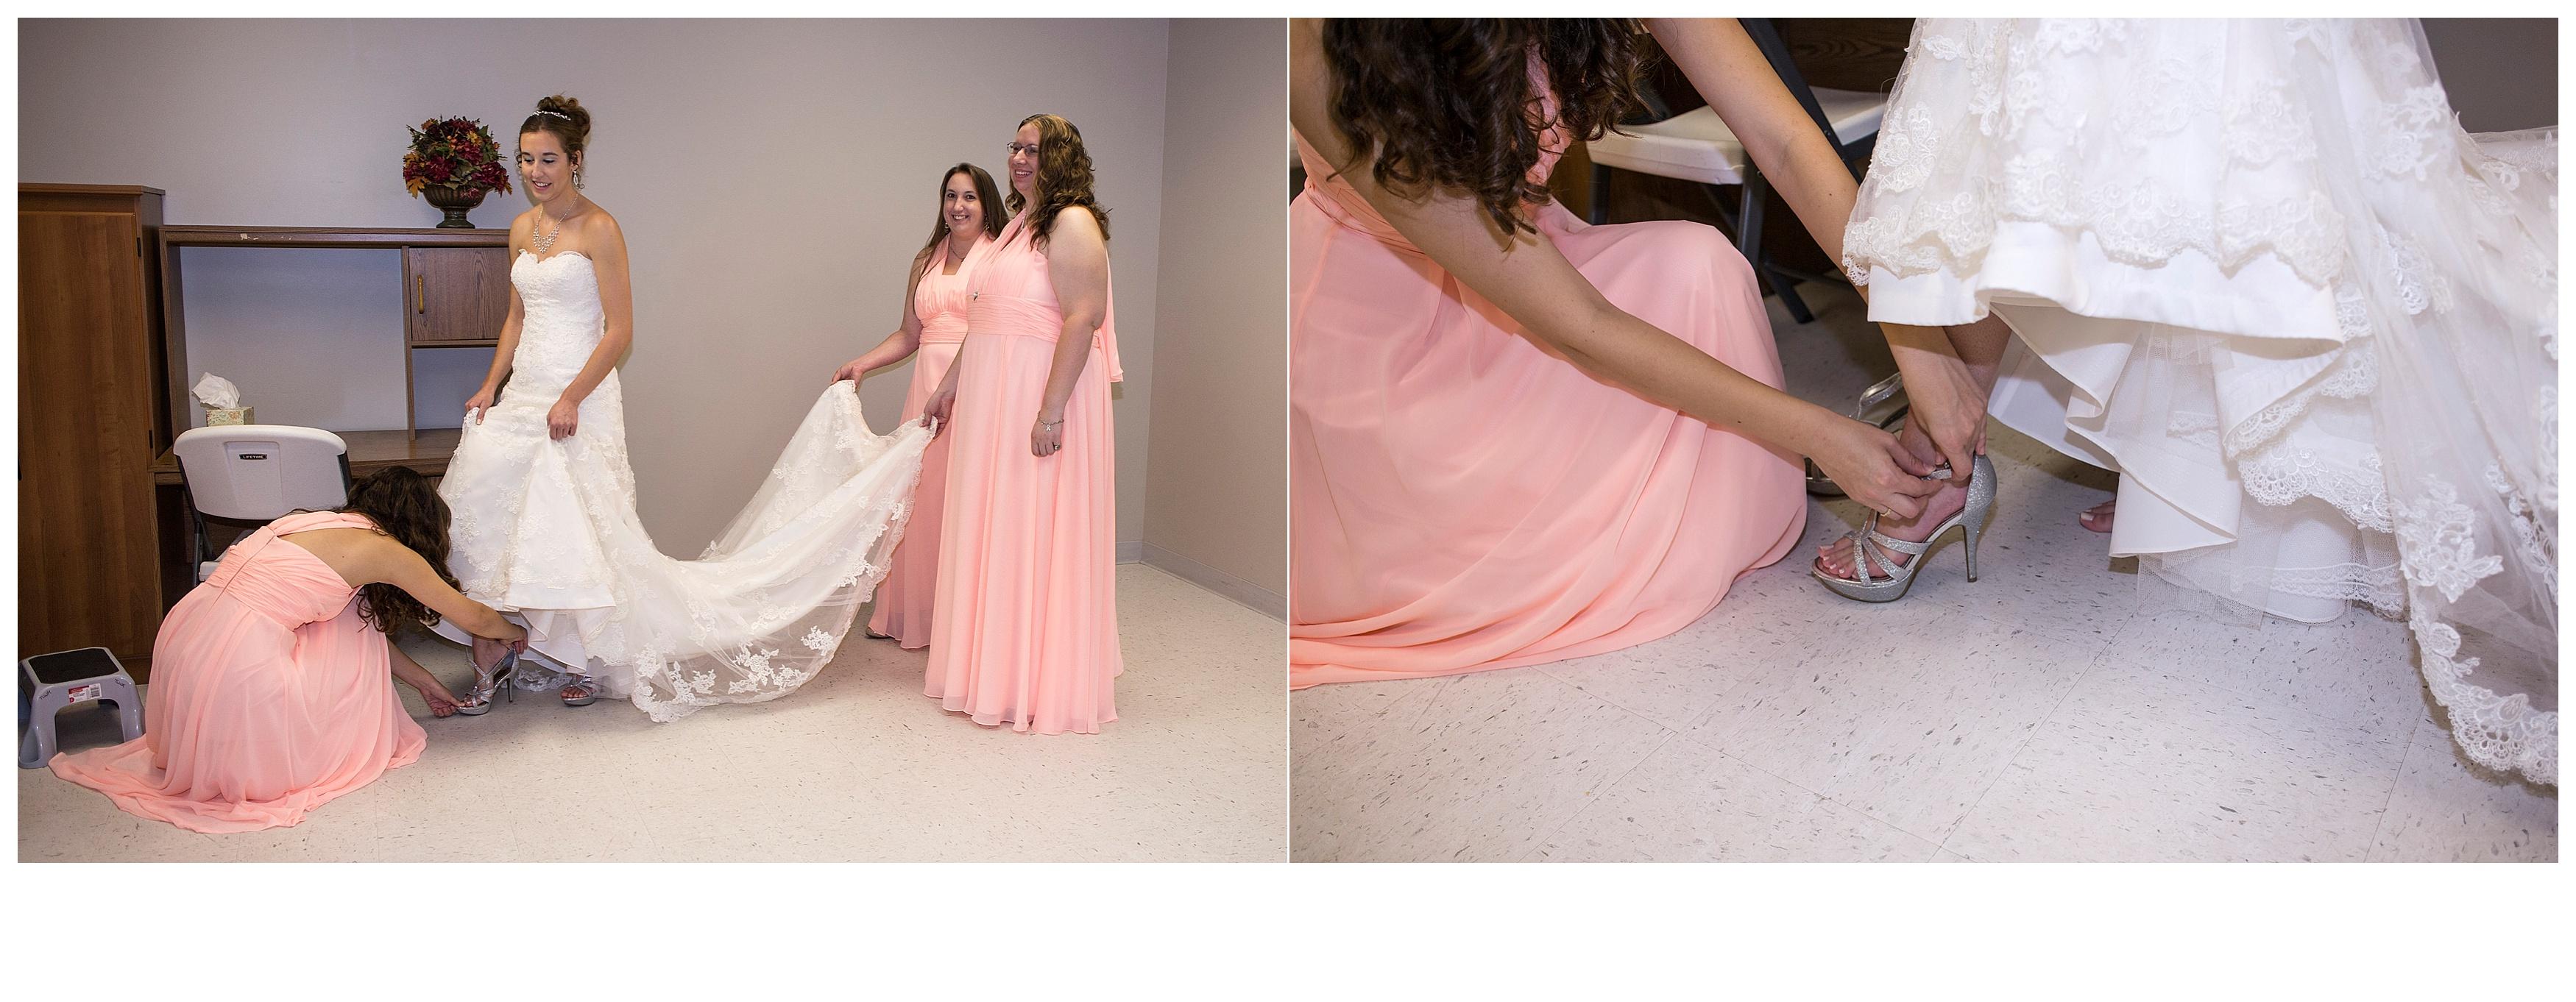 Emily Wedding_044 copy.jpg